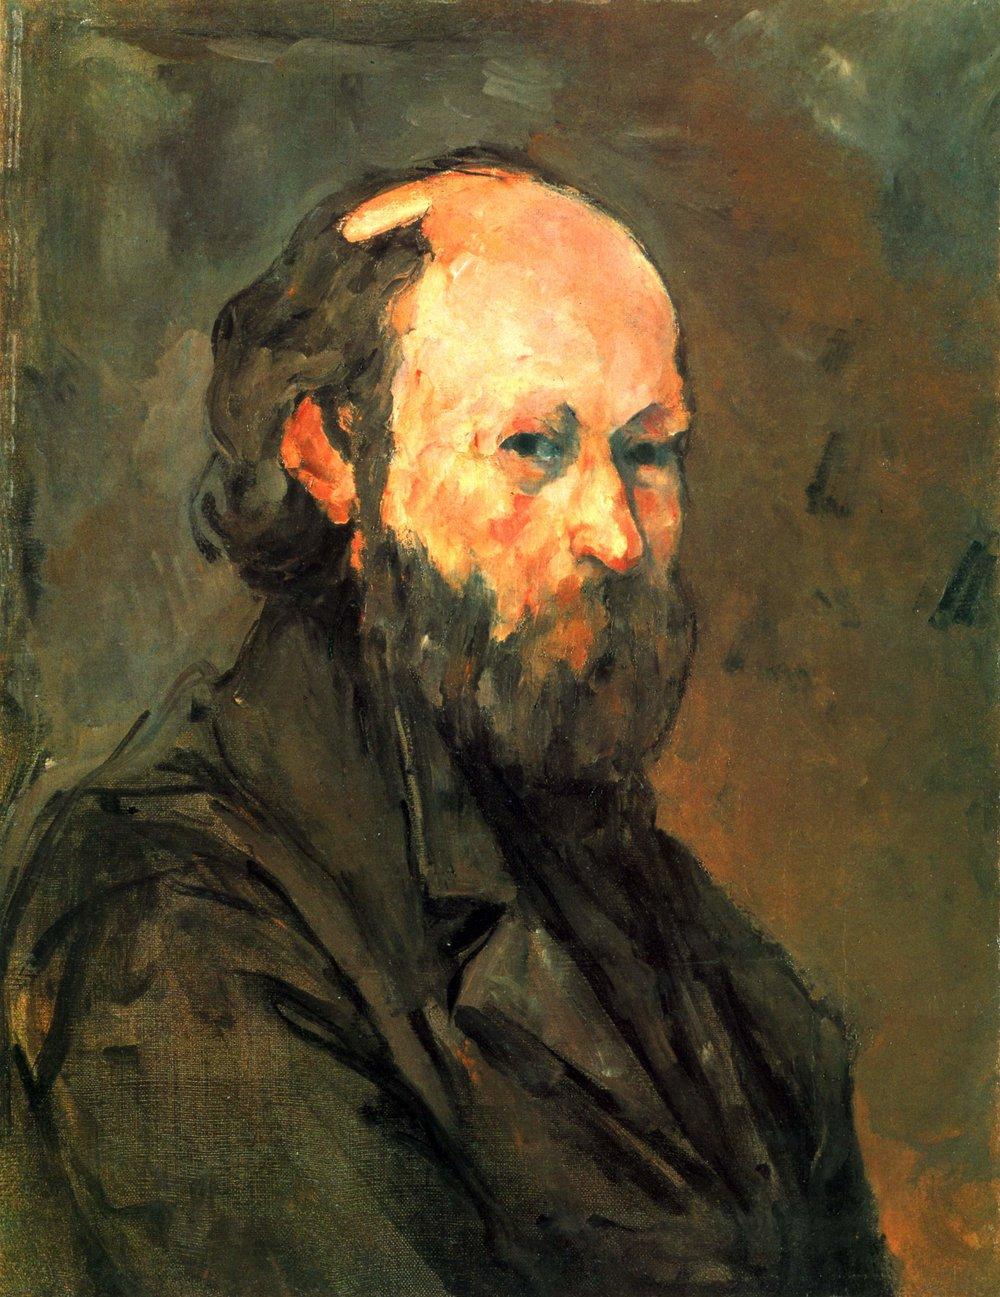 Paul Cézanne - 1839-1906